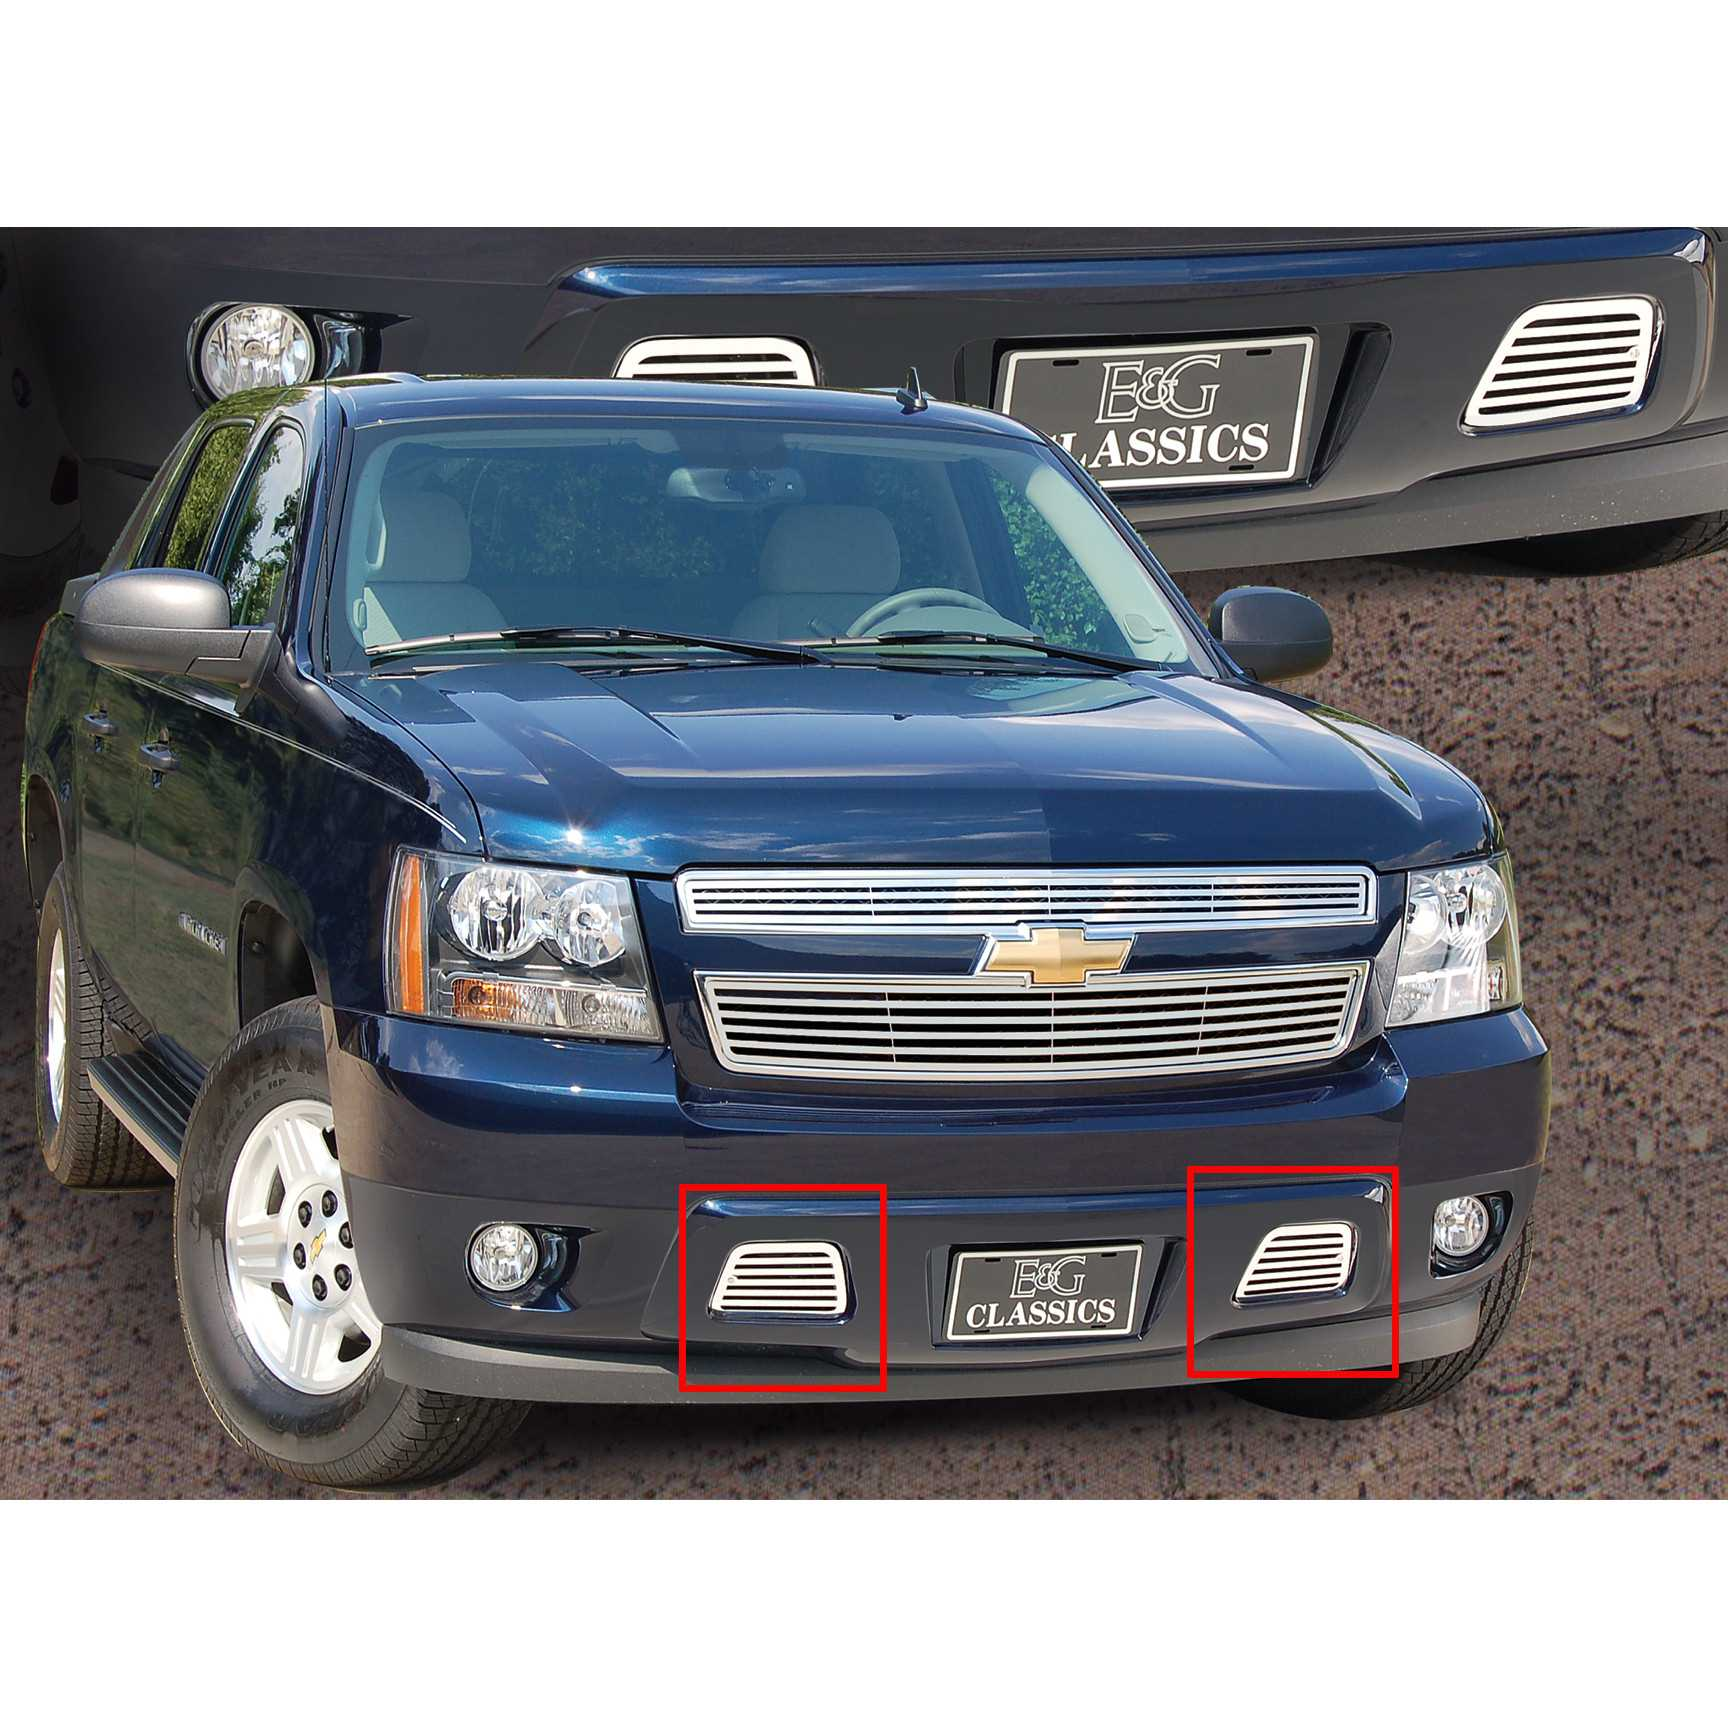 2007 Chevrolet Tahoe Accessories.html